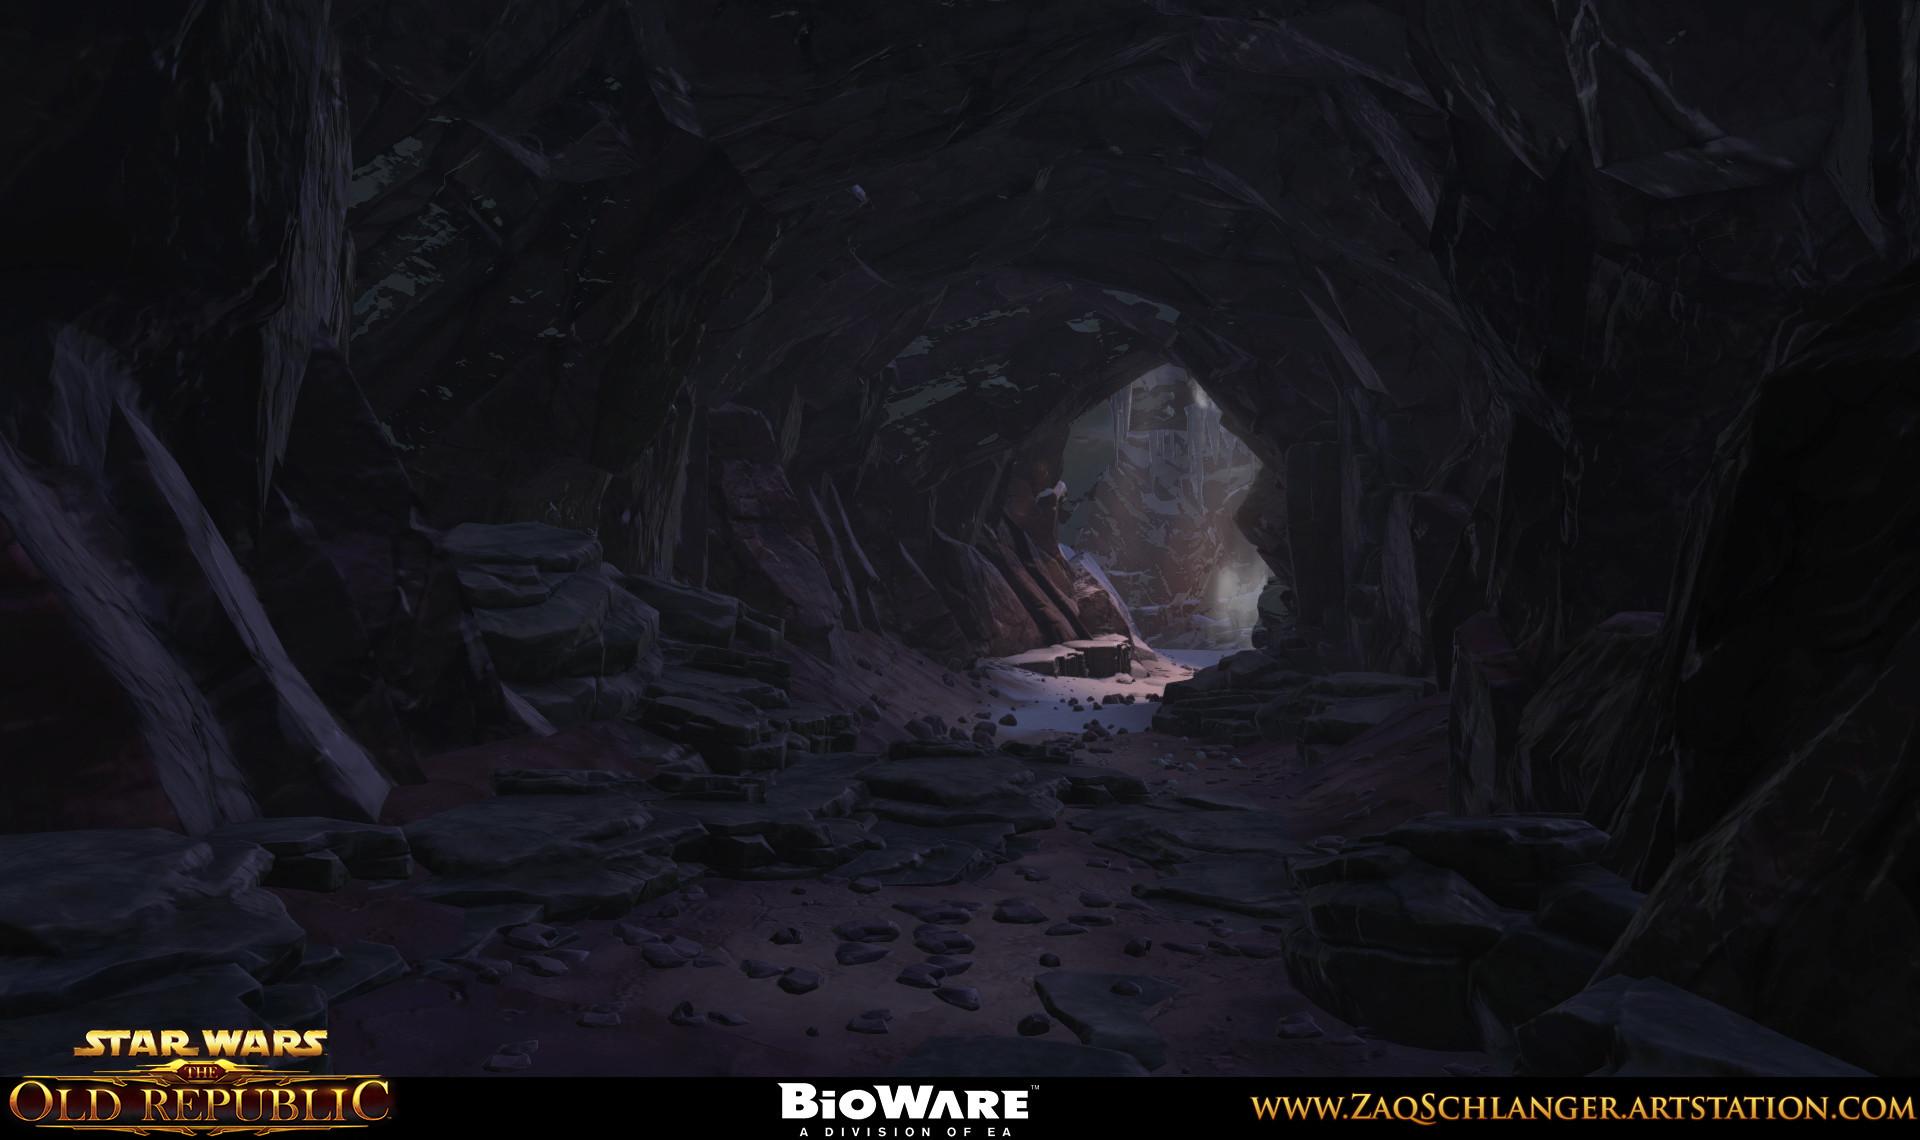 Zachary schlanger zaqschlanger copero caves natural 04